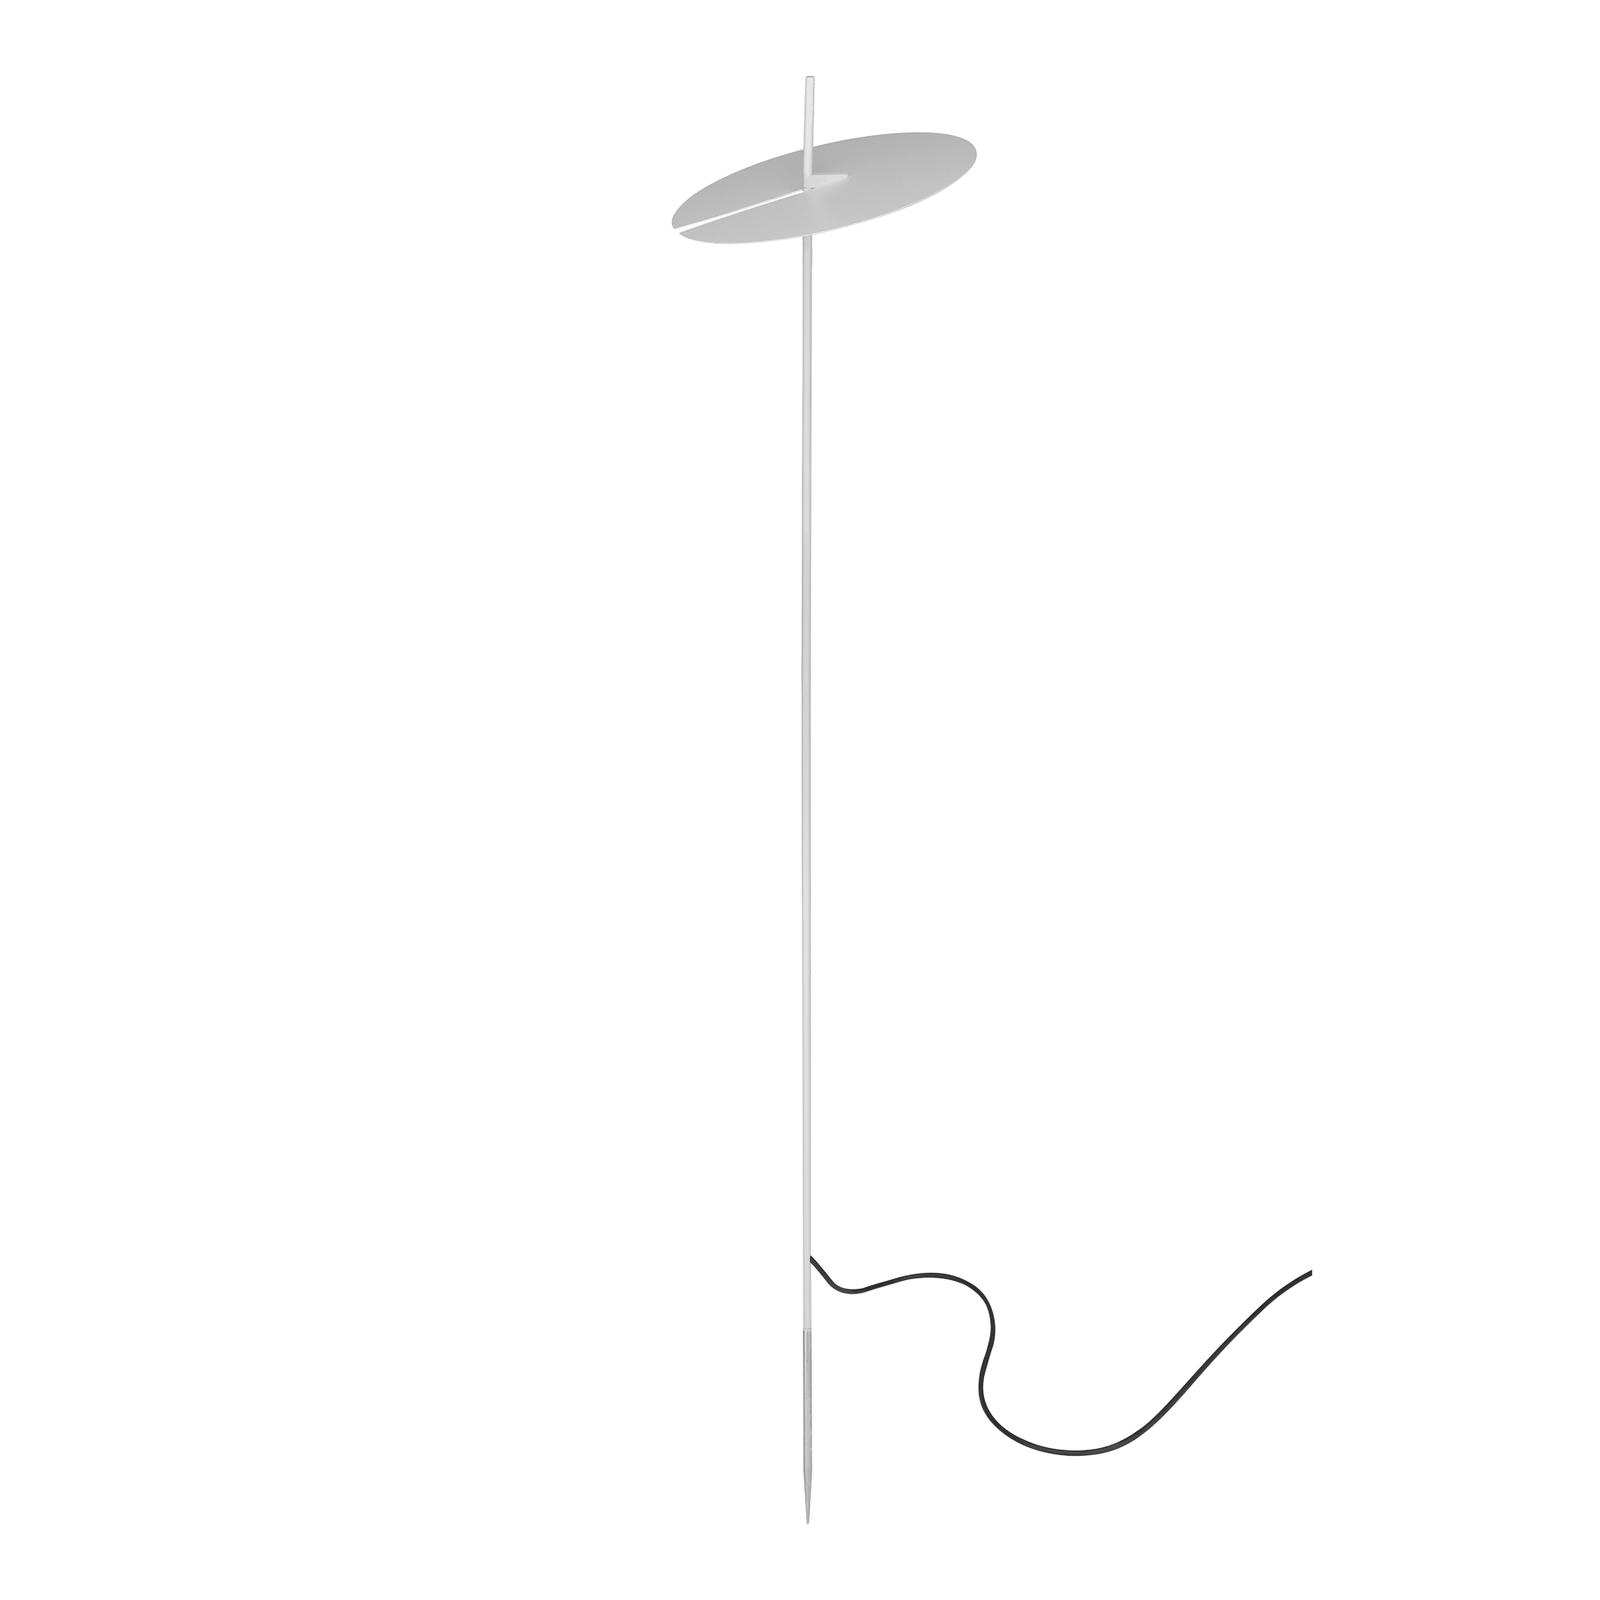 Karman Xana utomhus LED-hänglampa vit höjd 130 cm